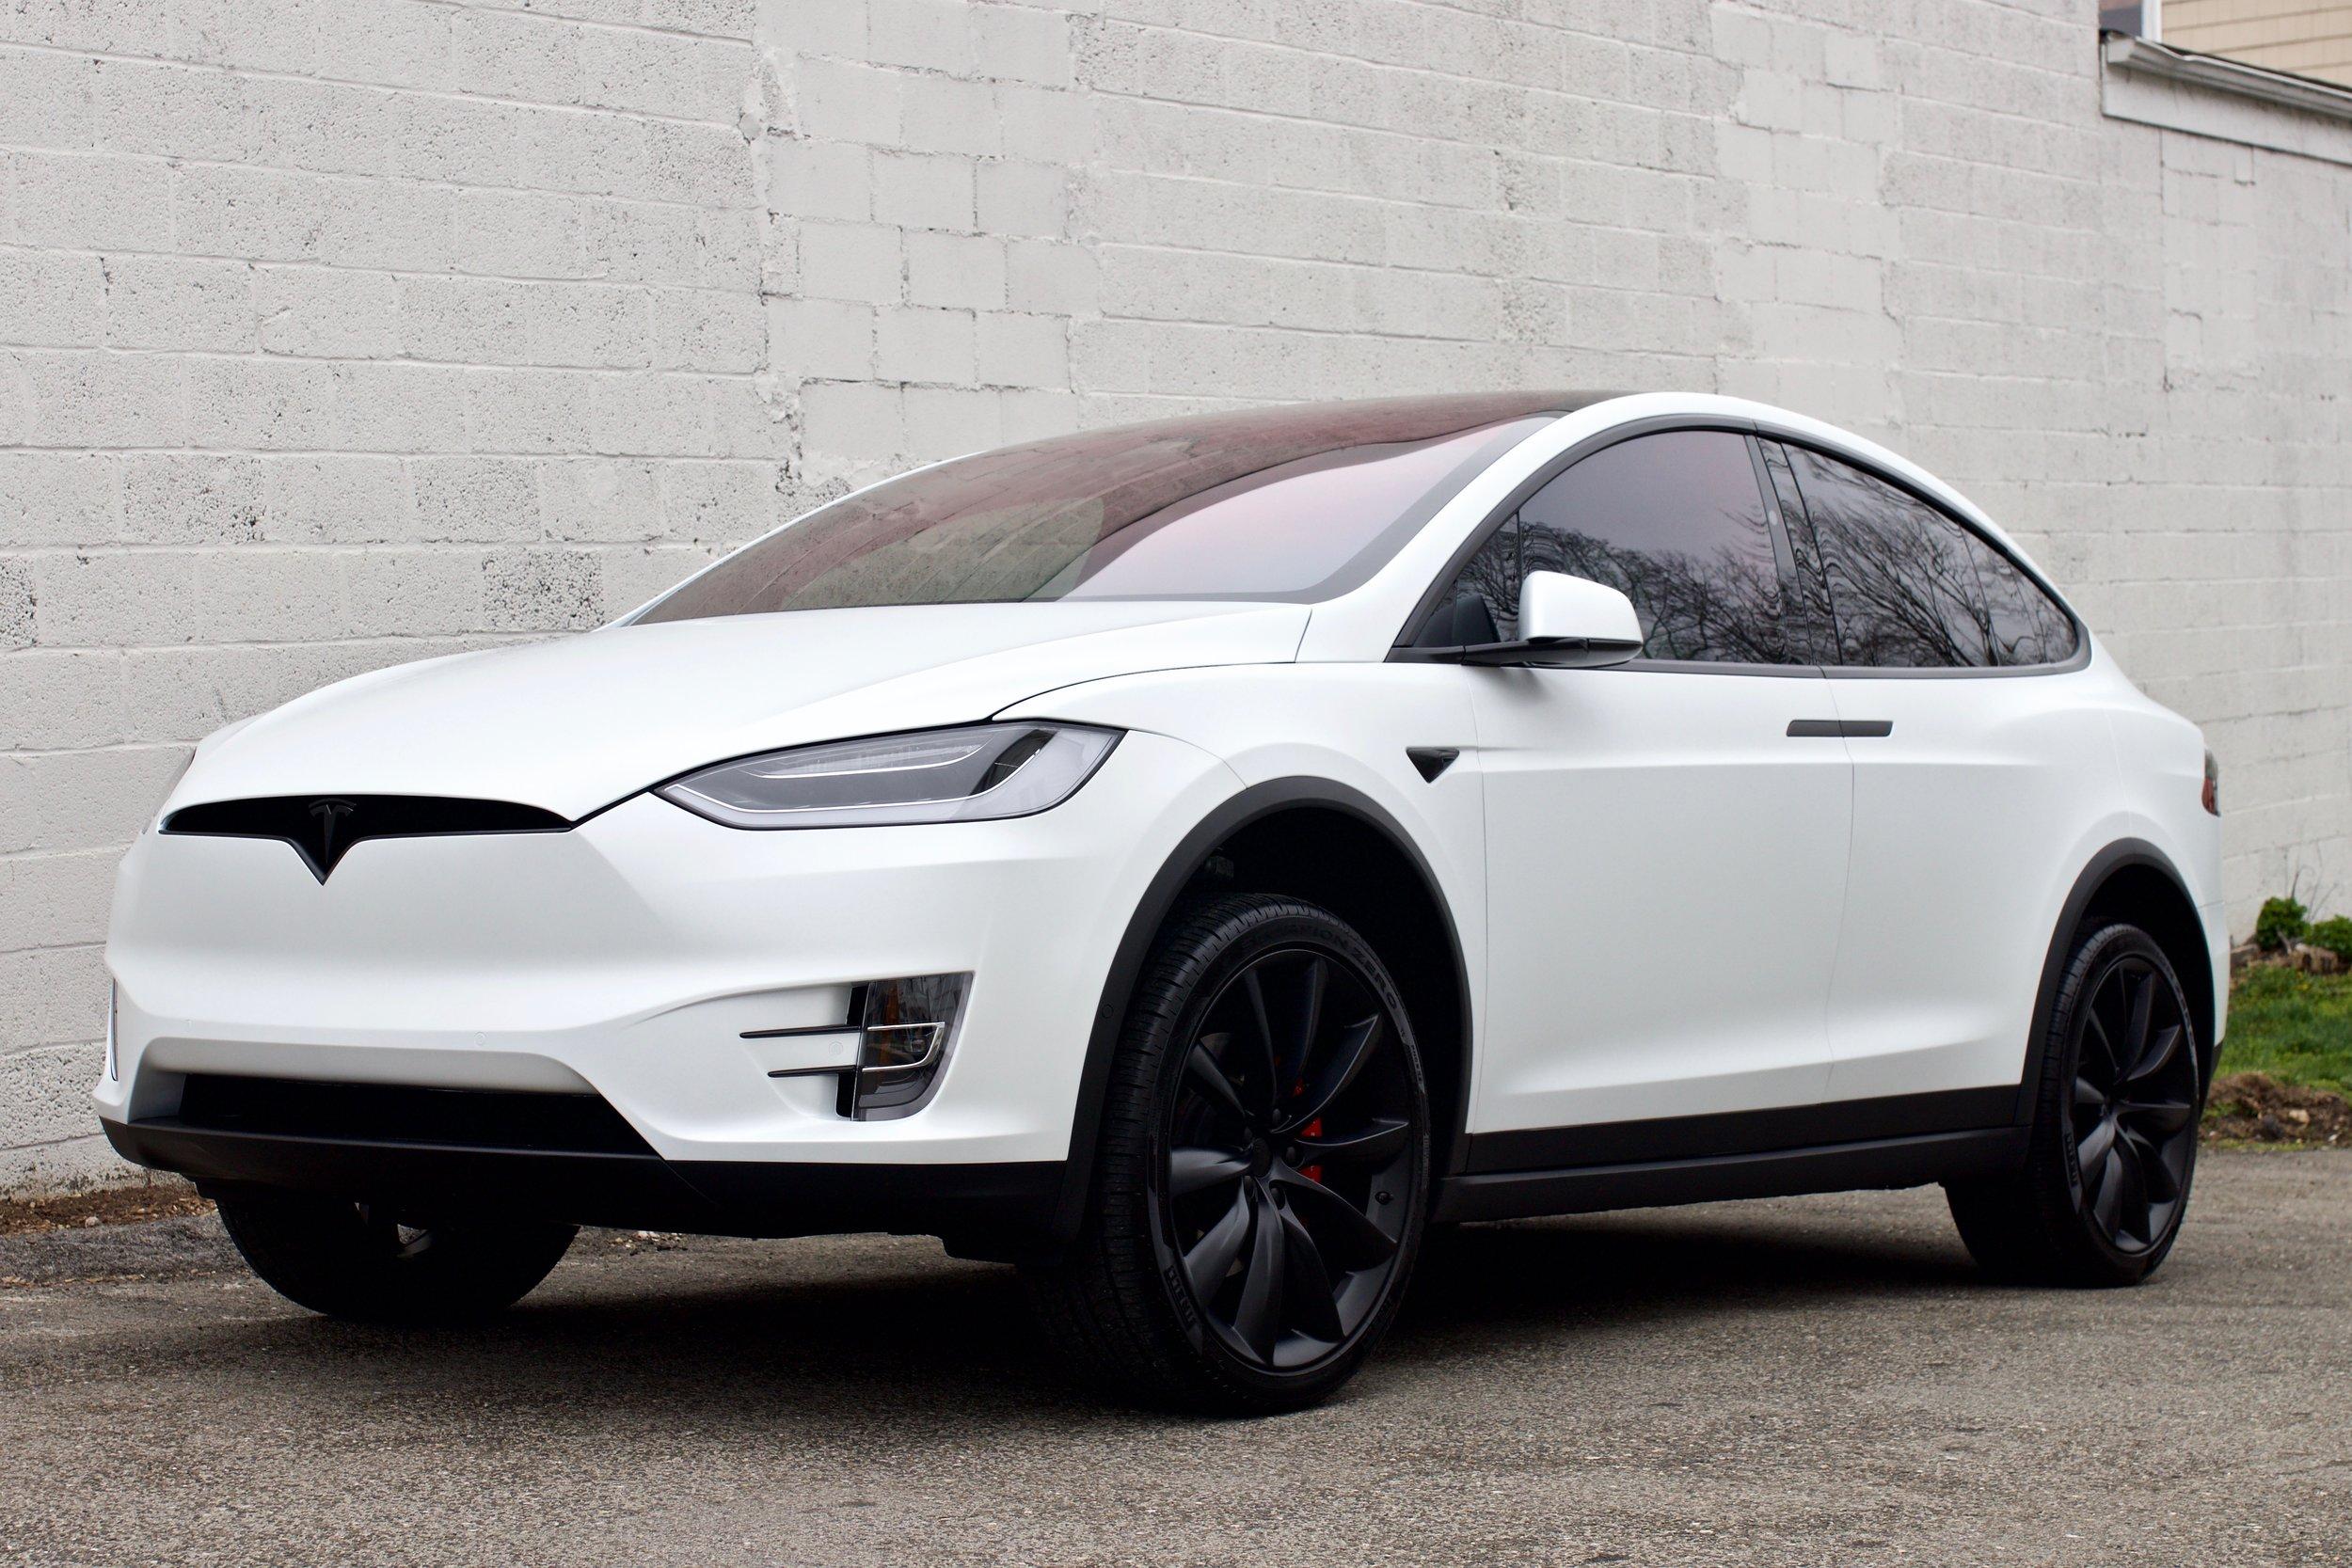 Tesla Model X - Xpel Stealth Paint Protection Film - Chrome Delete - CQuartz Professional - Window Tint